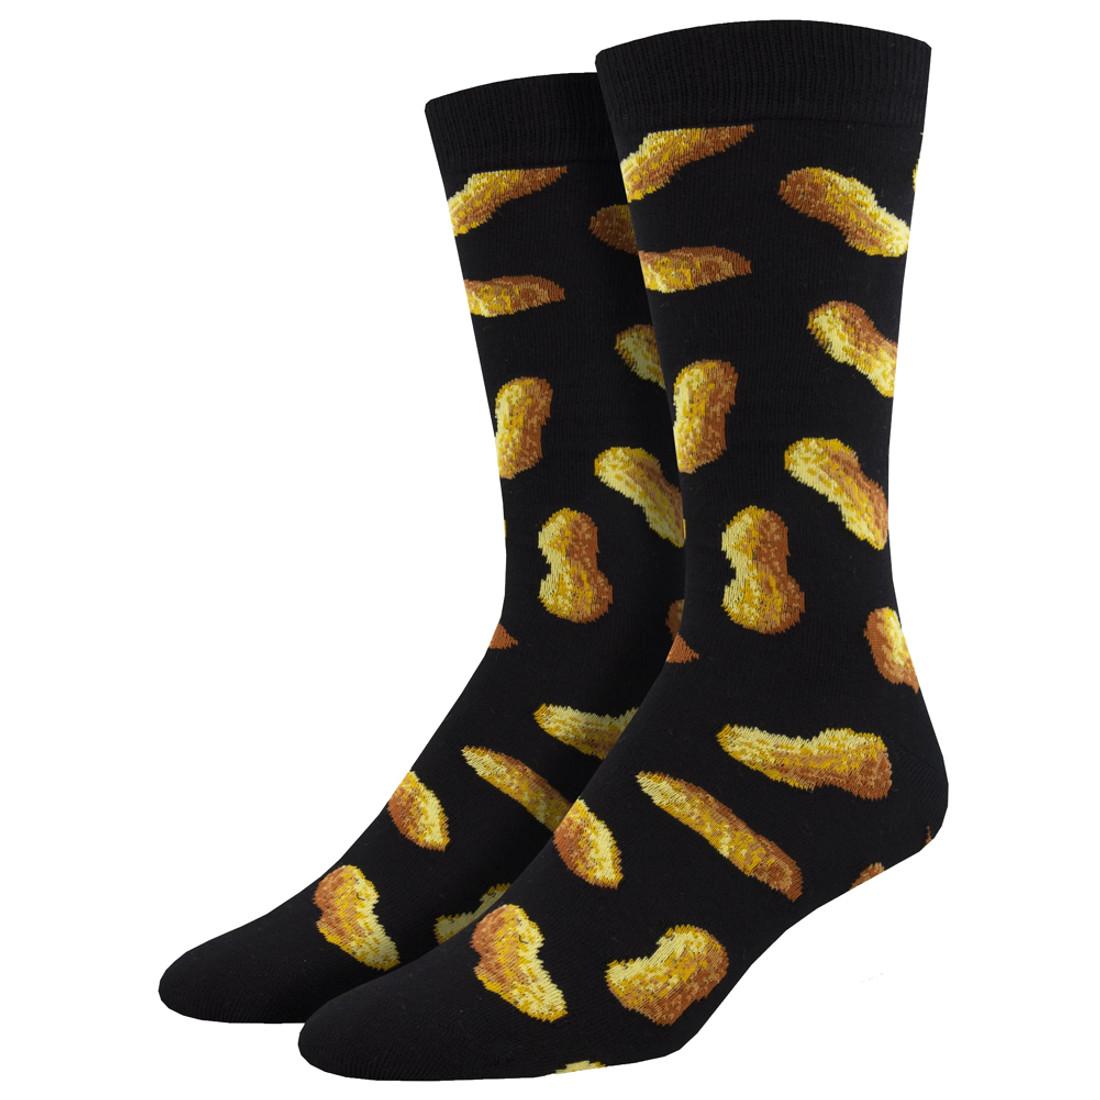 Go Nuts Peanut Men's Crew Socks